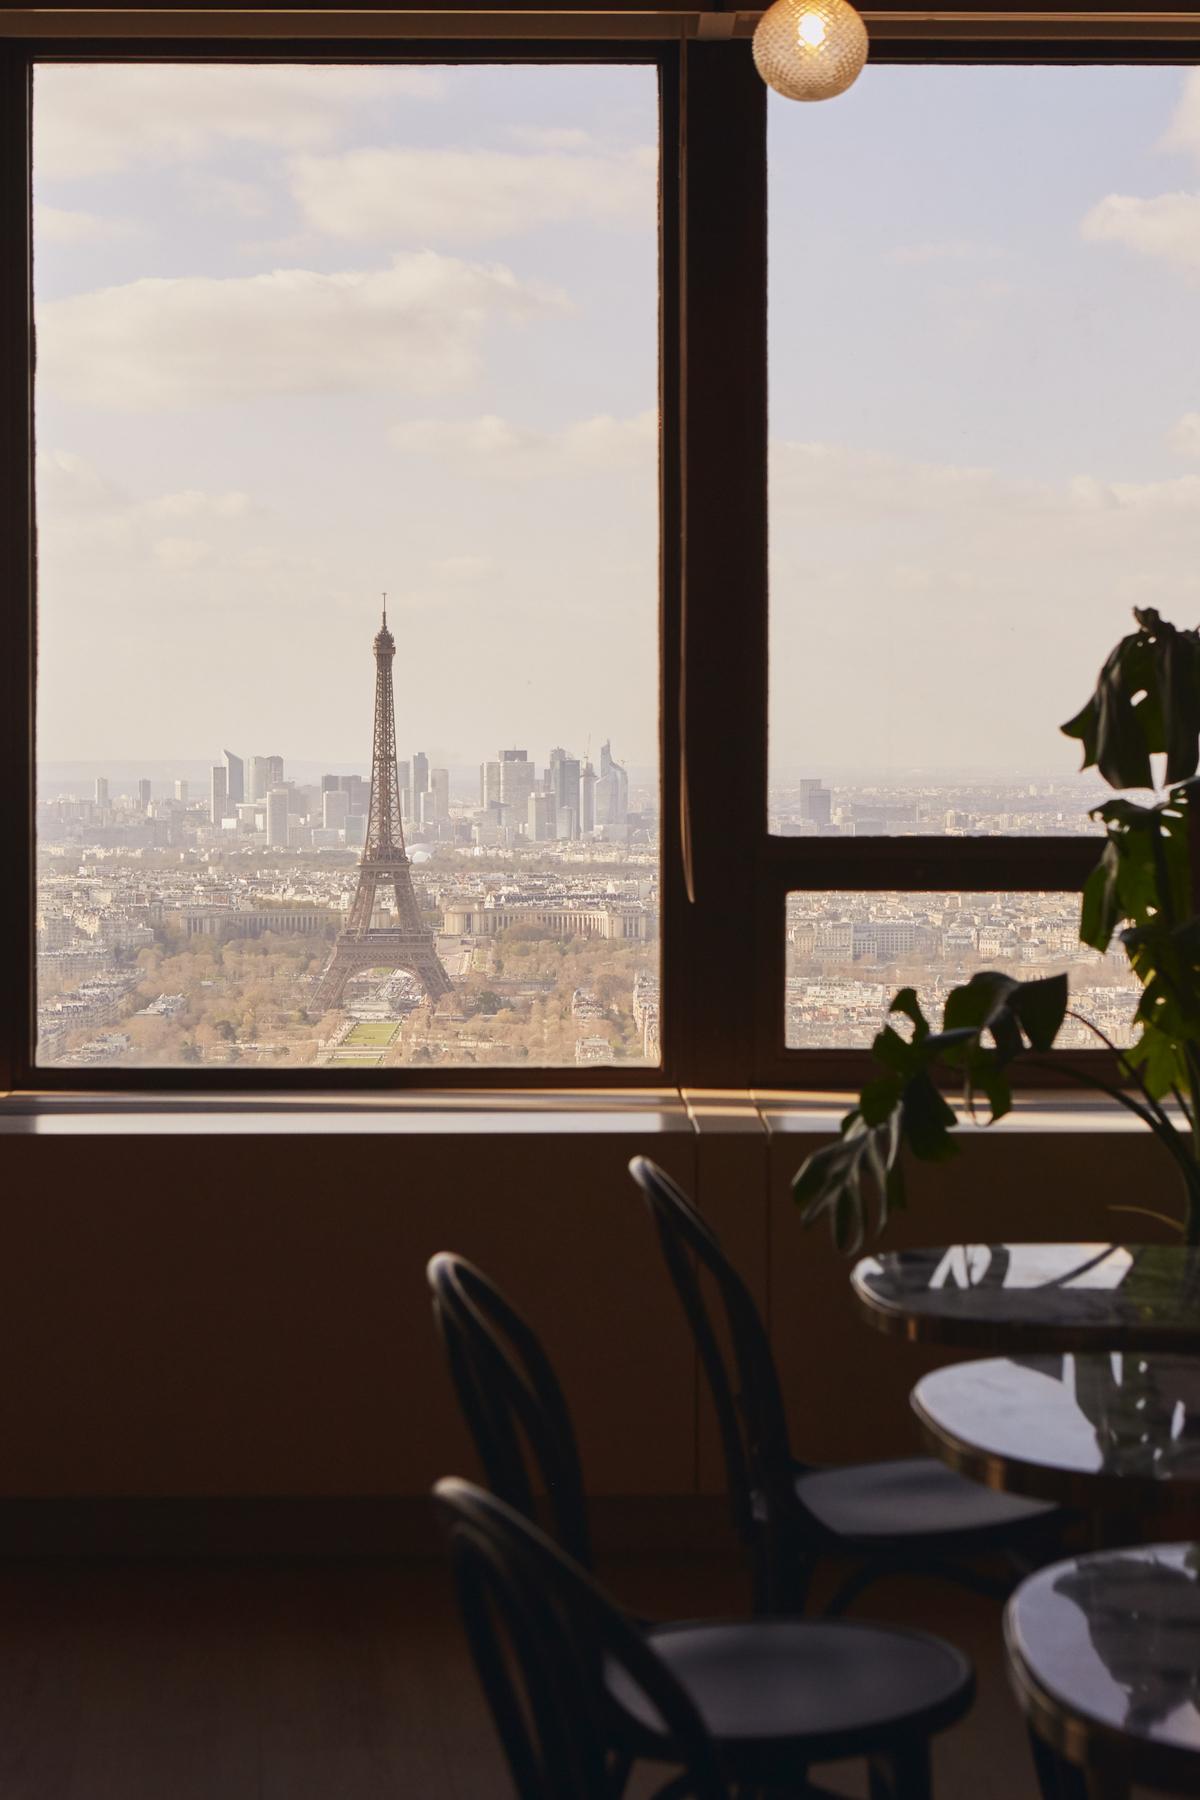 Morning coworking Paris montparnasse travail work share office eiffel tower